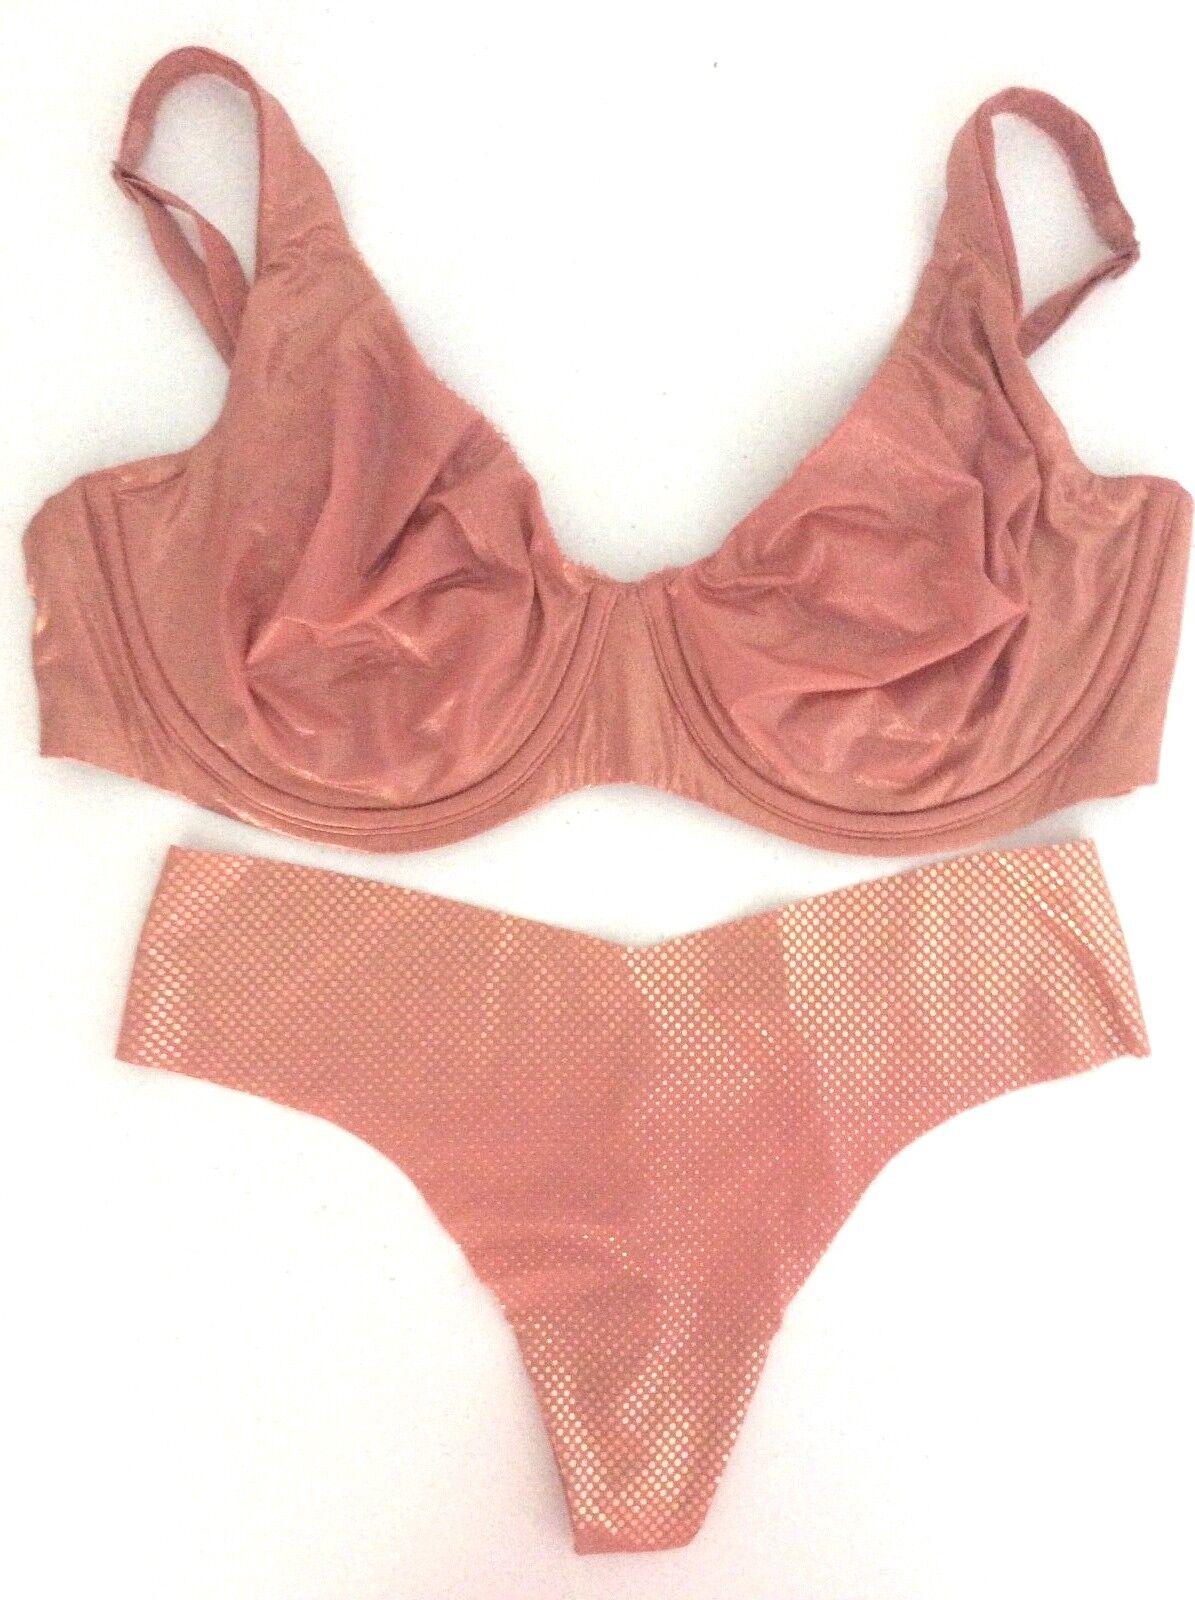 NEW Victoria's Secret Body By Victoria Unlined Plunge Shine Bra Panty Set 38DD L